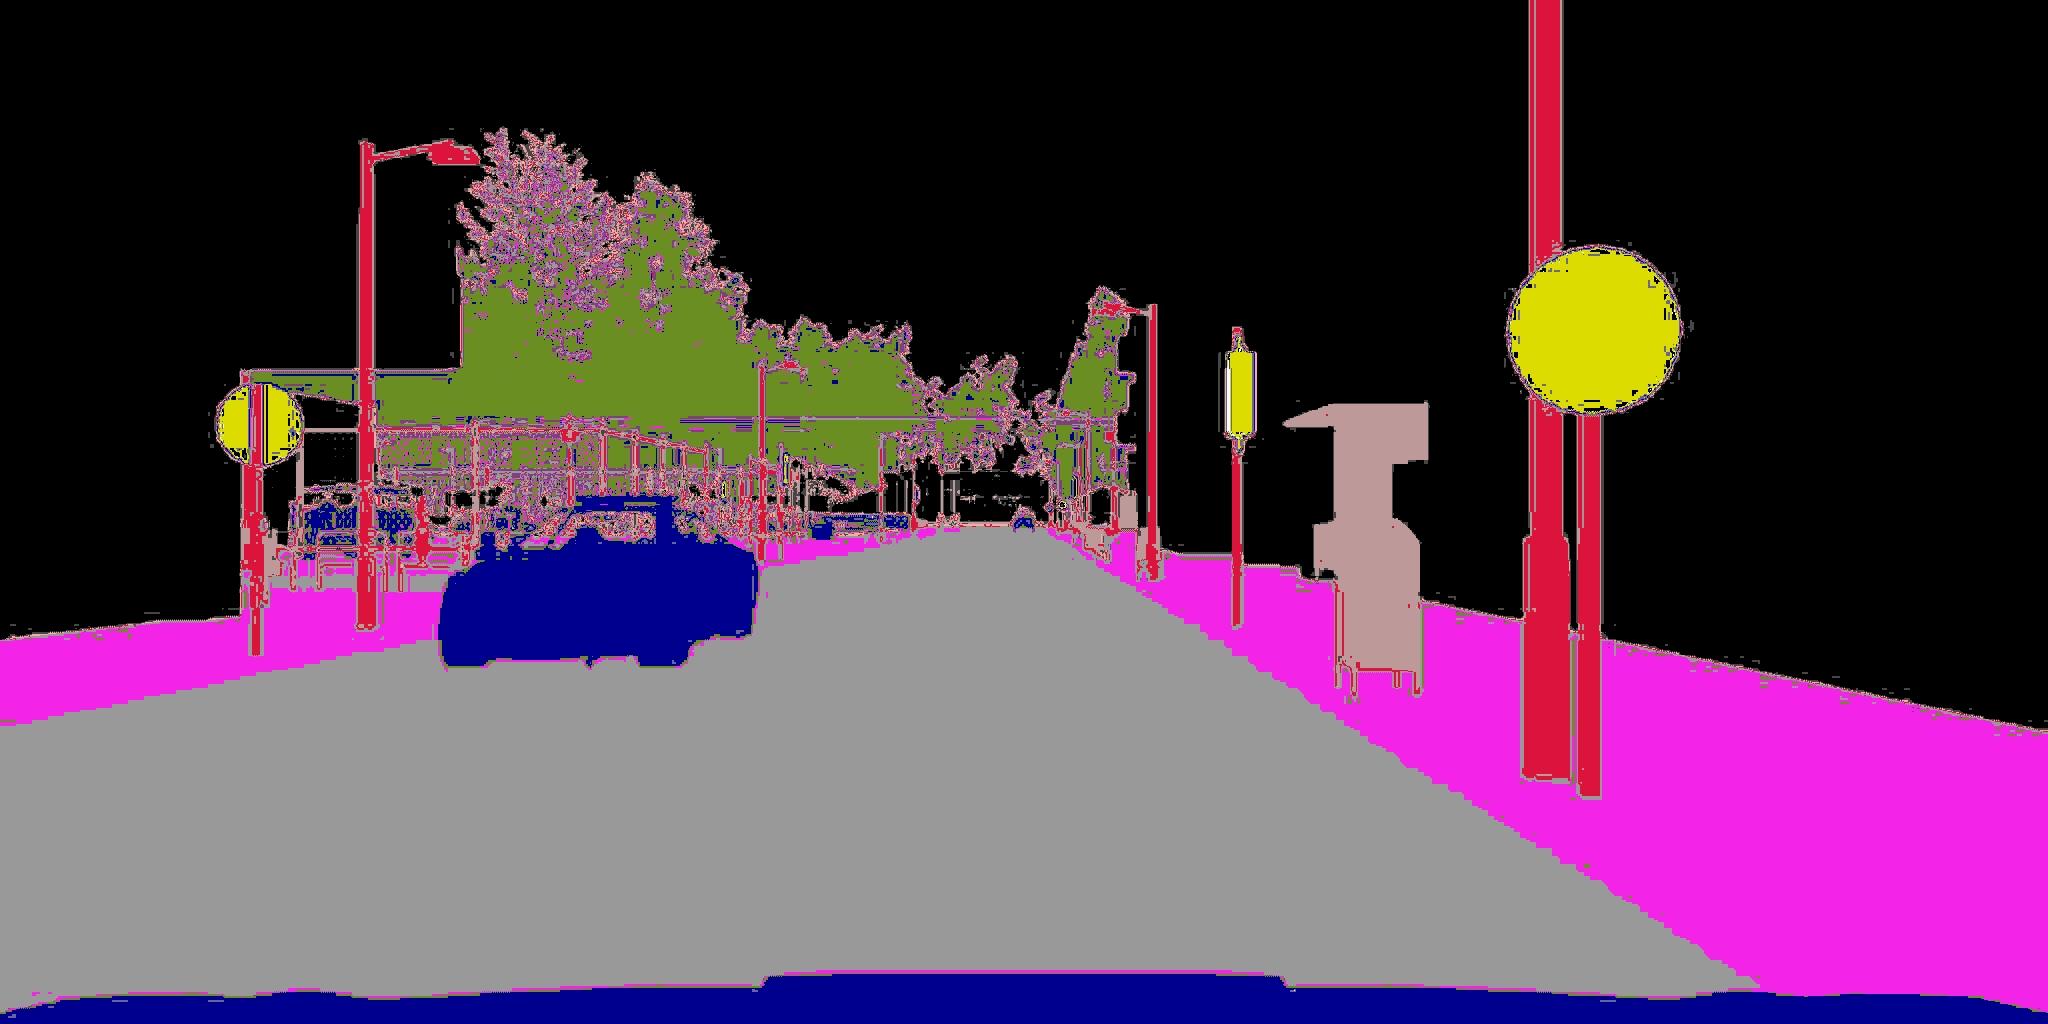 weird Segmentation picture · Issue #900 · carla-simulator